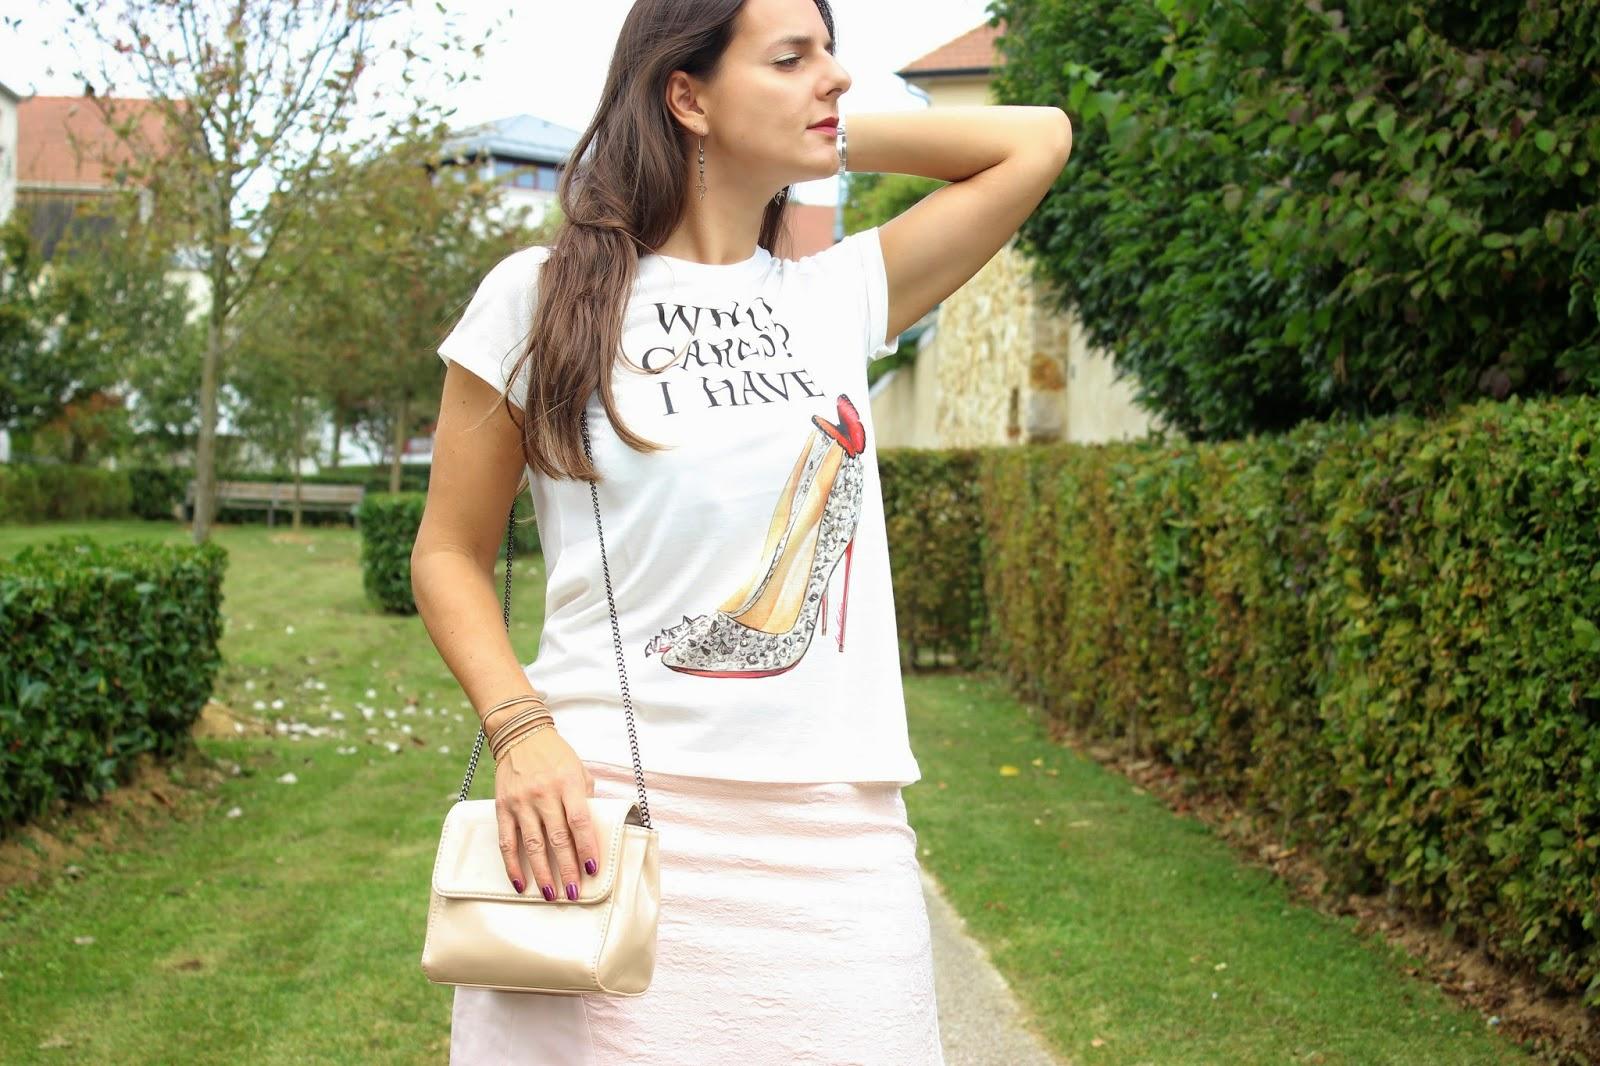 Top La Loba, jupe naf naf rose, sac Zara